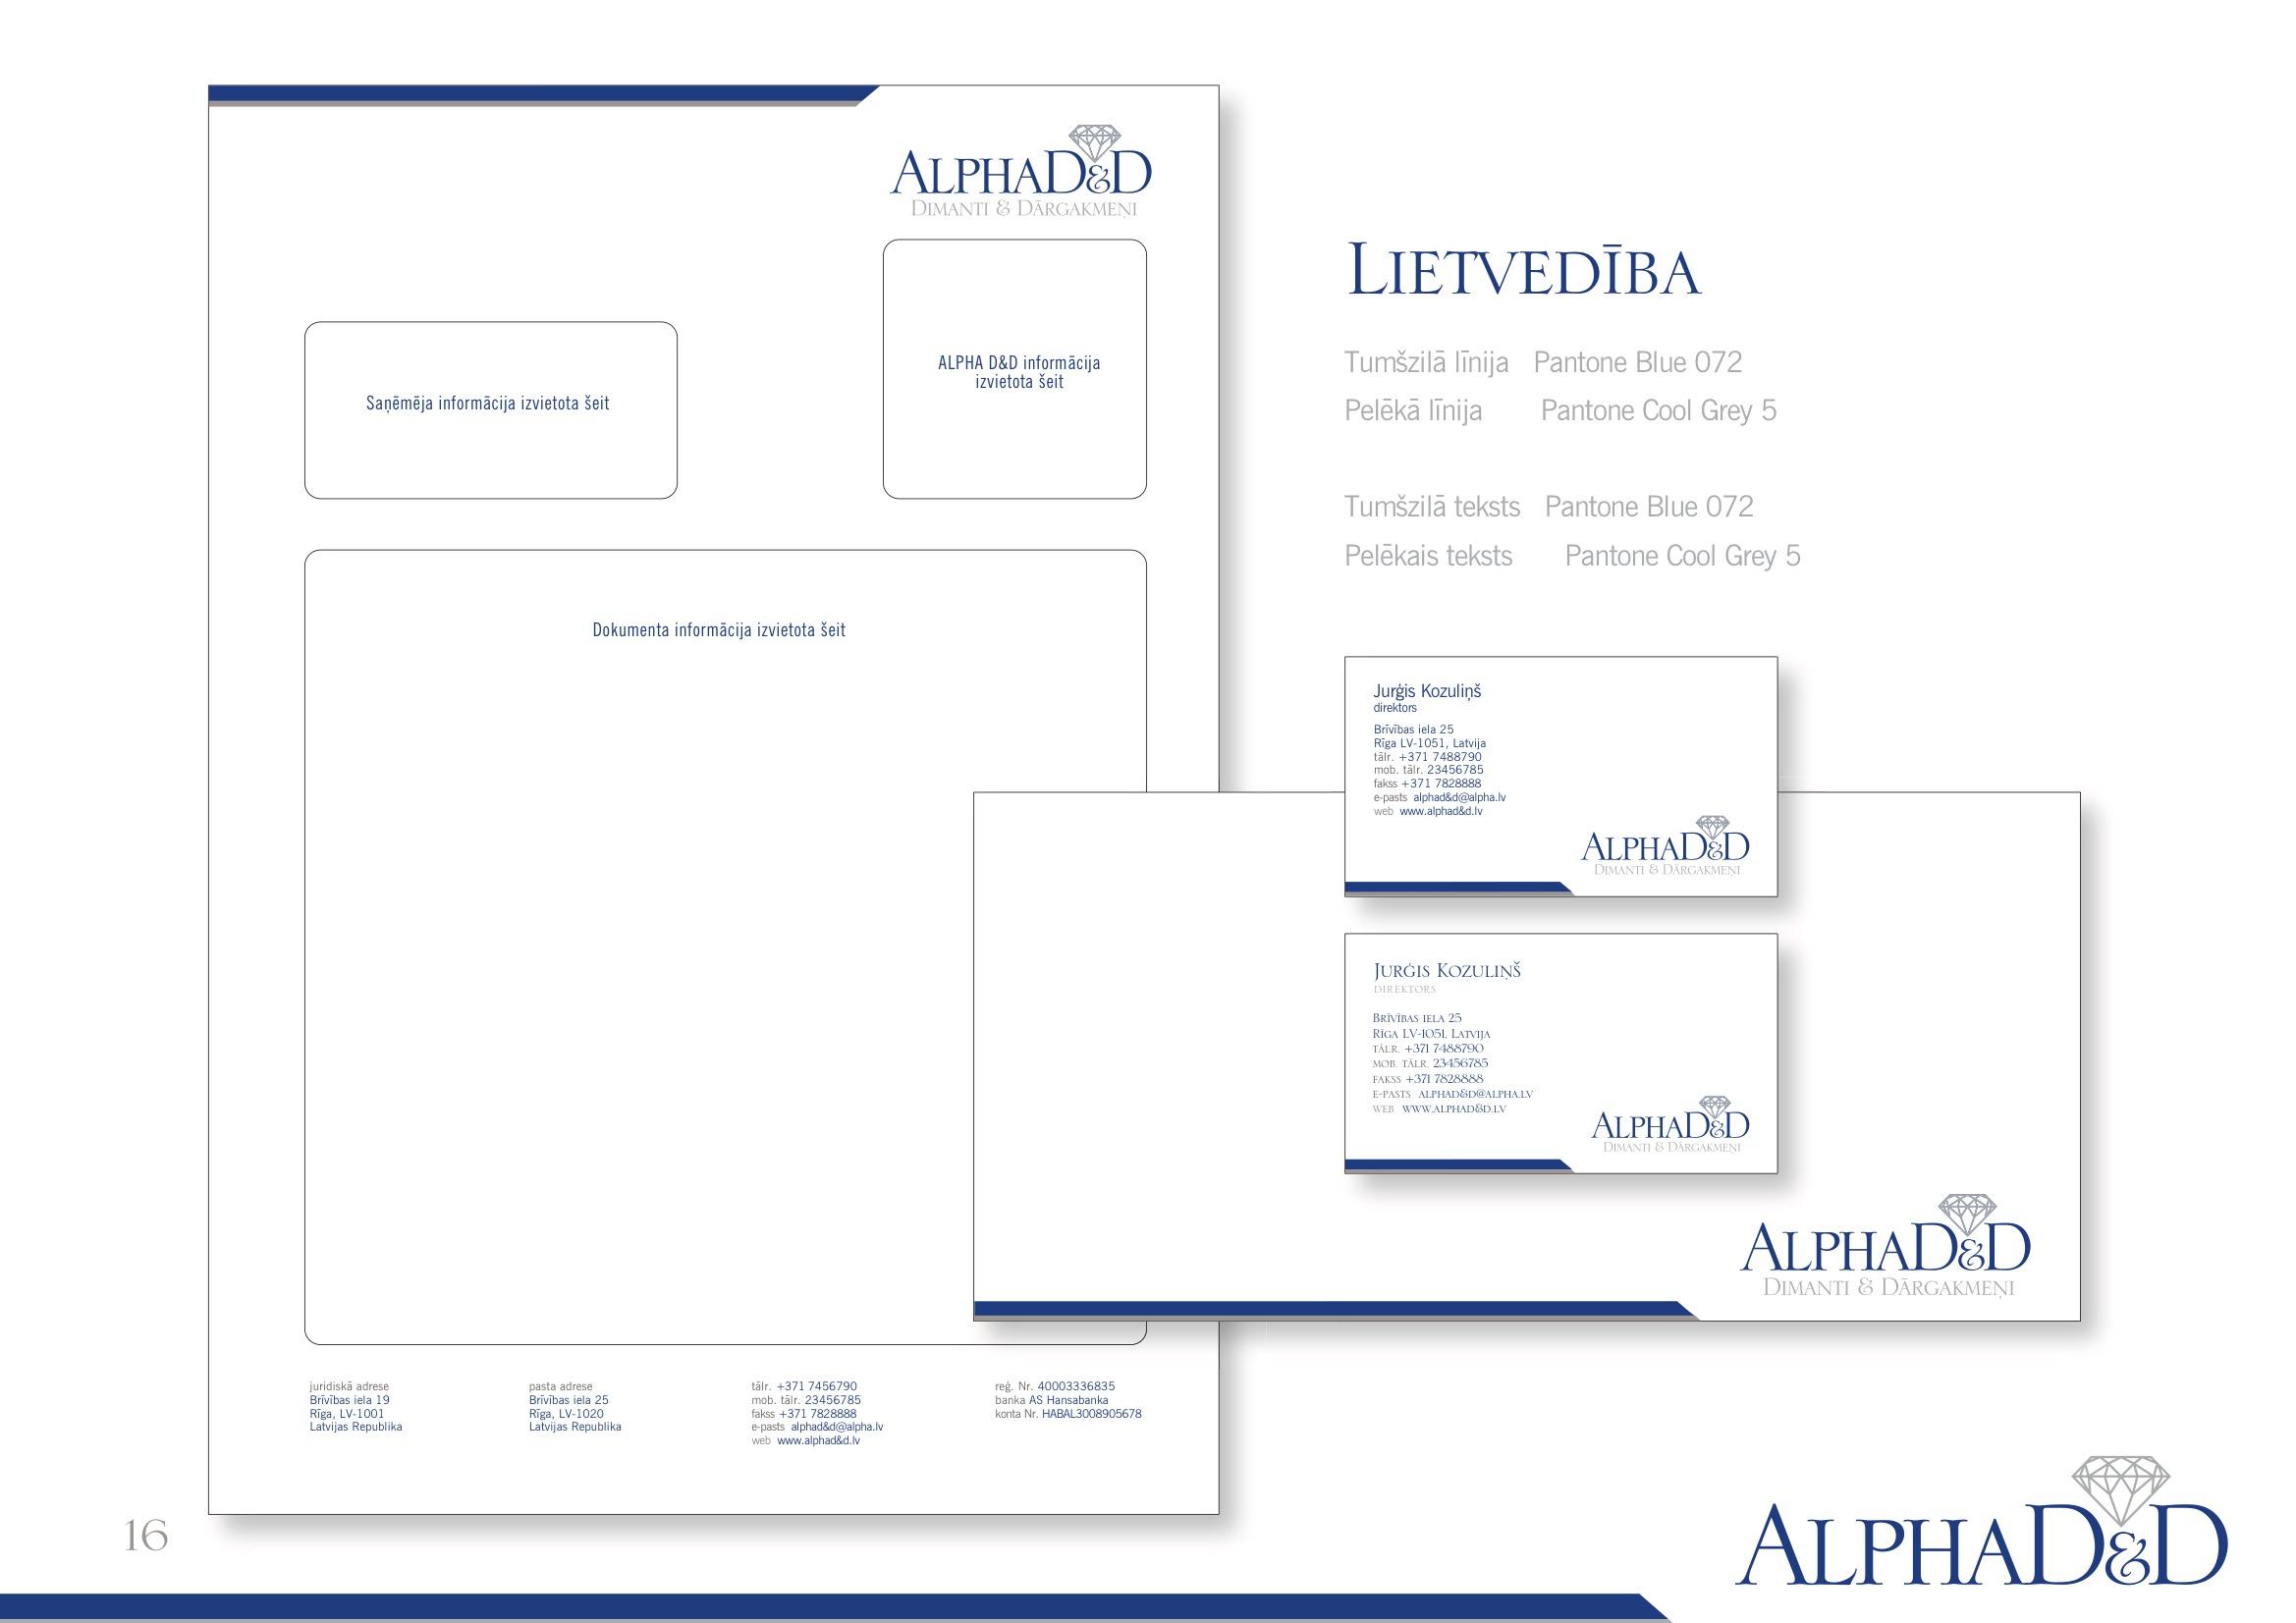 AlphaDD_Stils 16